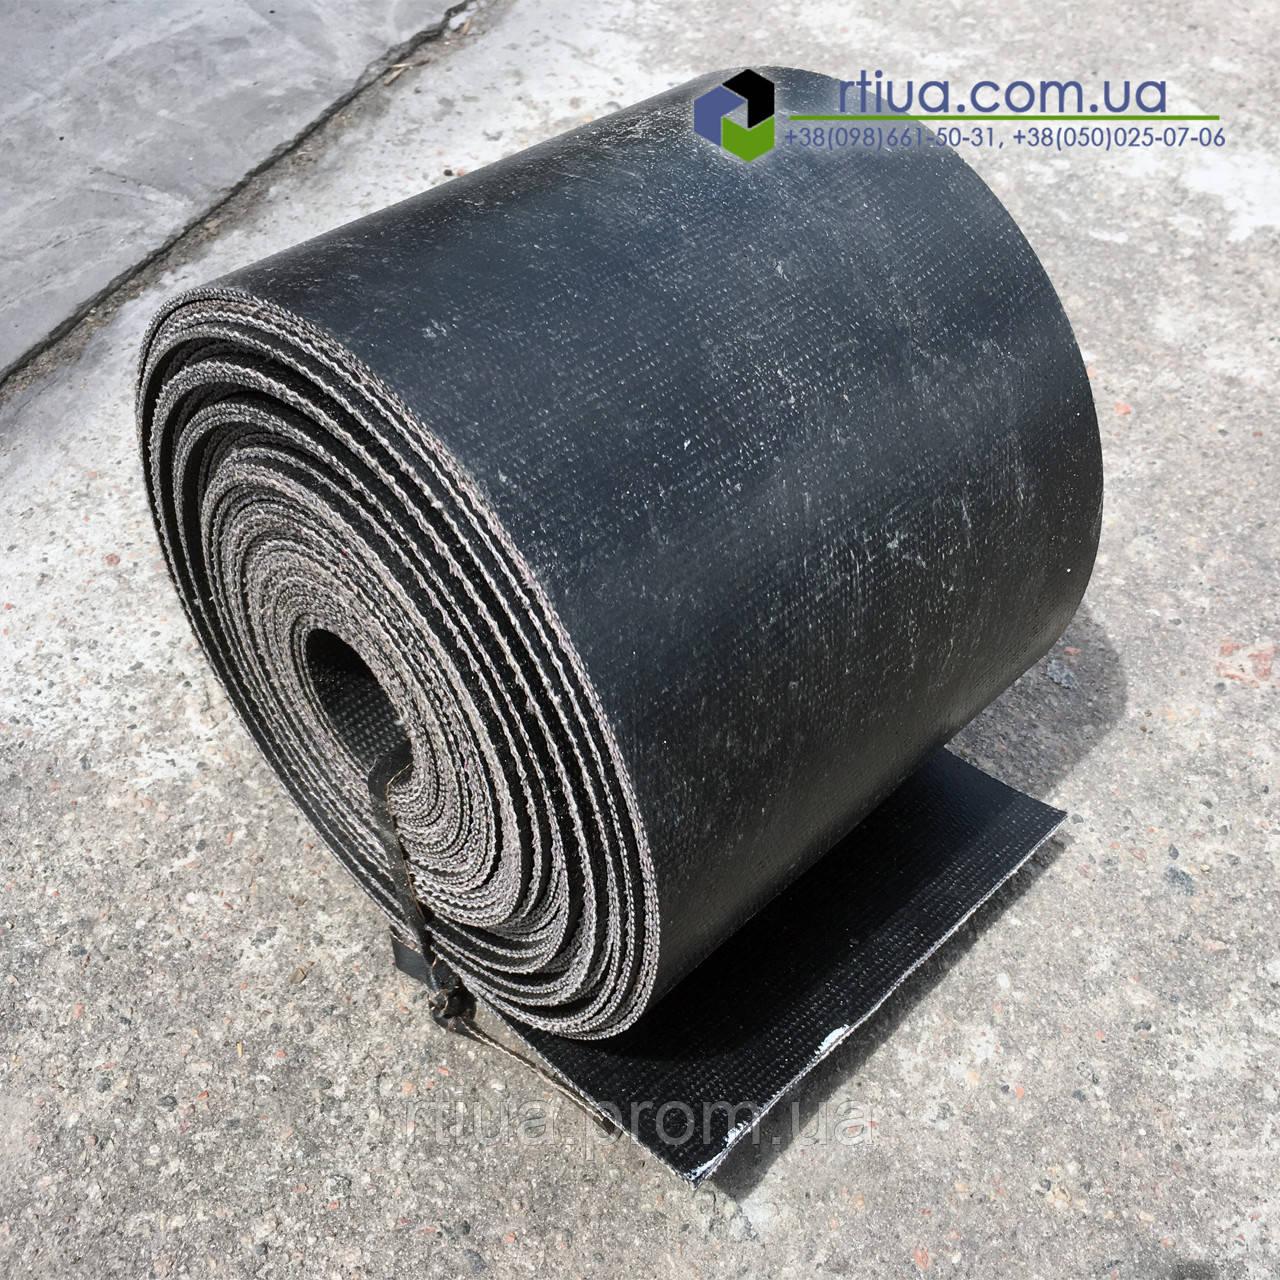 Транспортерная лента ТК-200, 600х5 - 5/2 (12 мм)